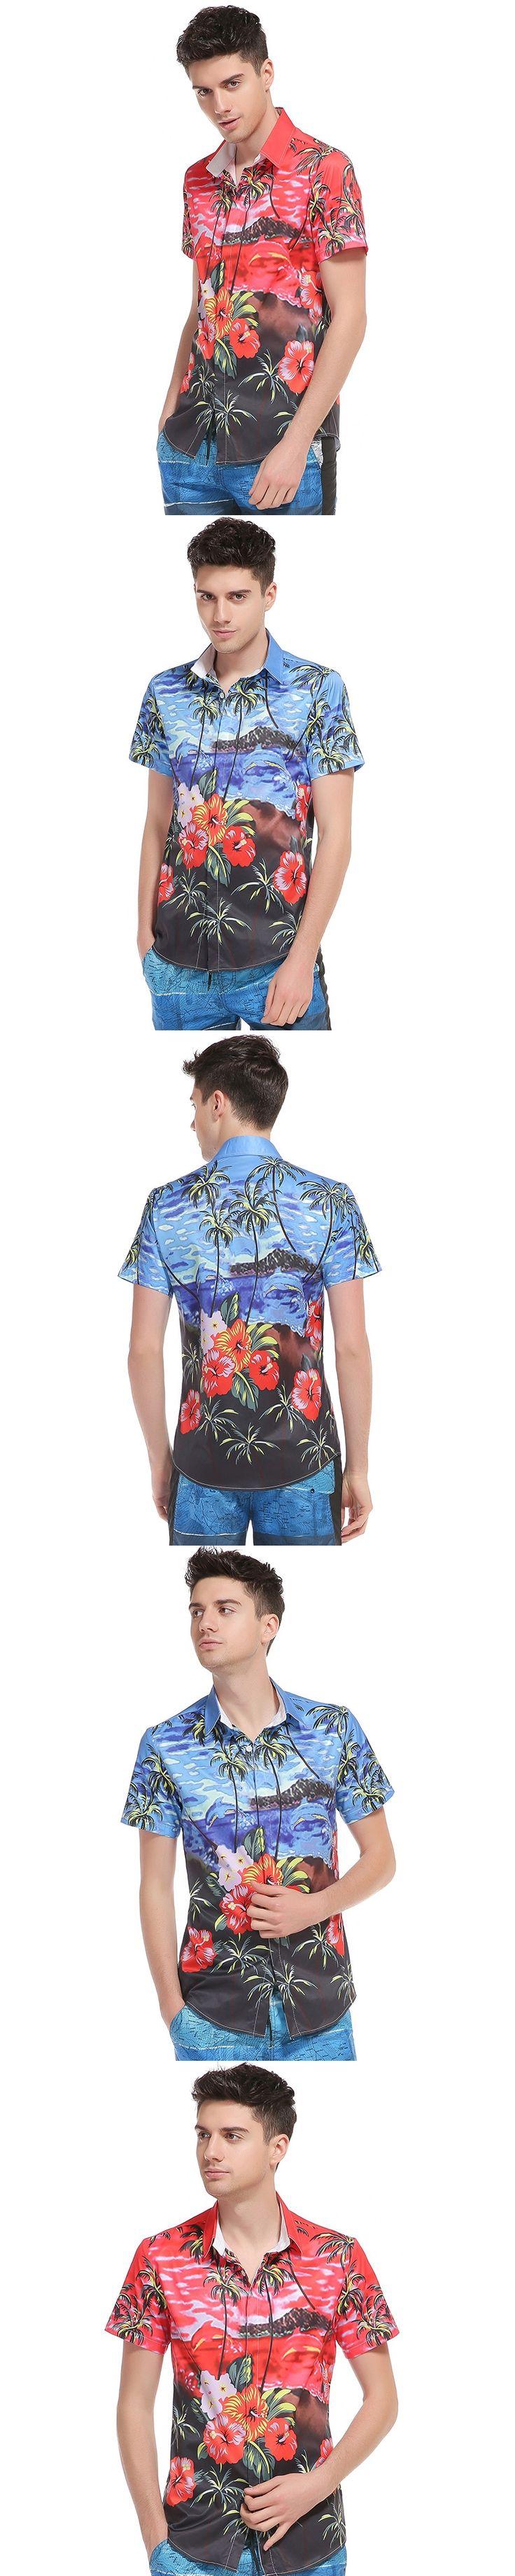 Outside the new model of real estate 3D men's printing palm tree beach printing men's short sleeved shirt DC47